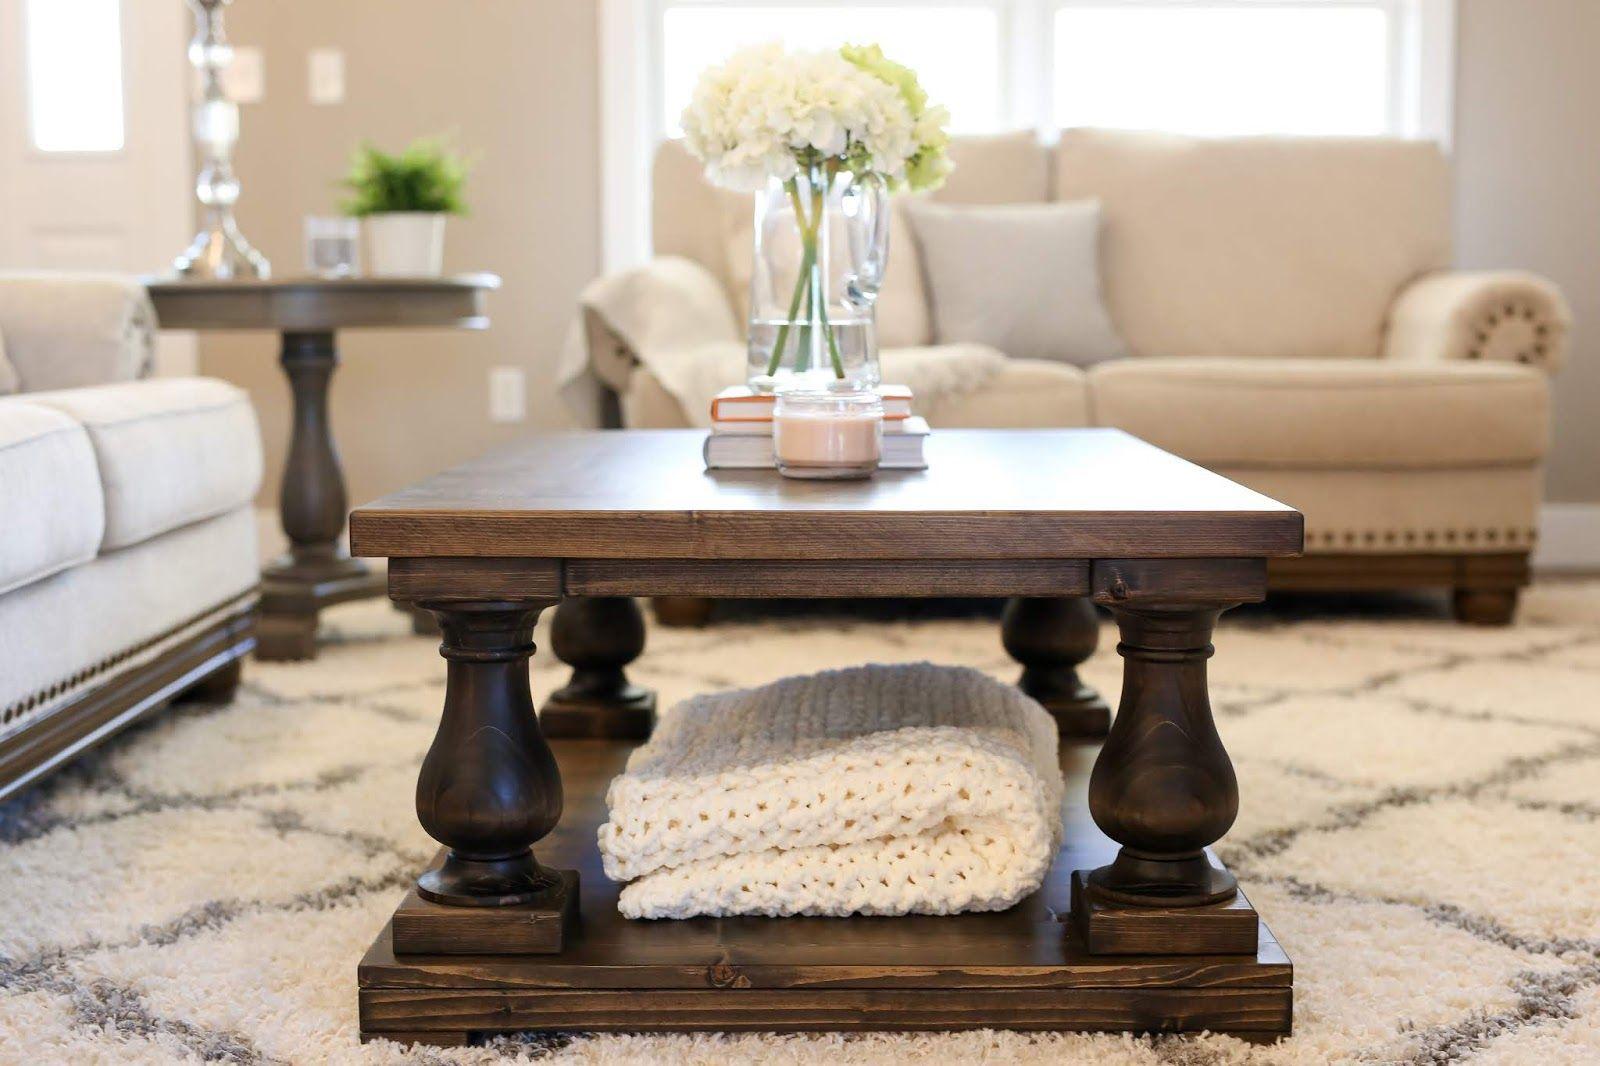 Balustrade coffee table diy plans diy coffee table